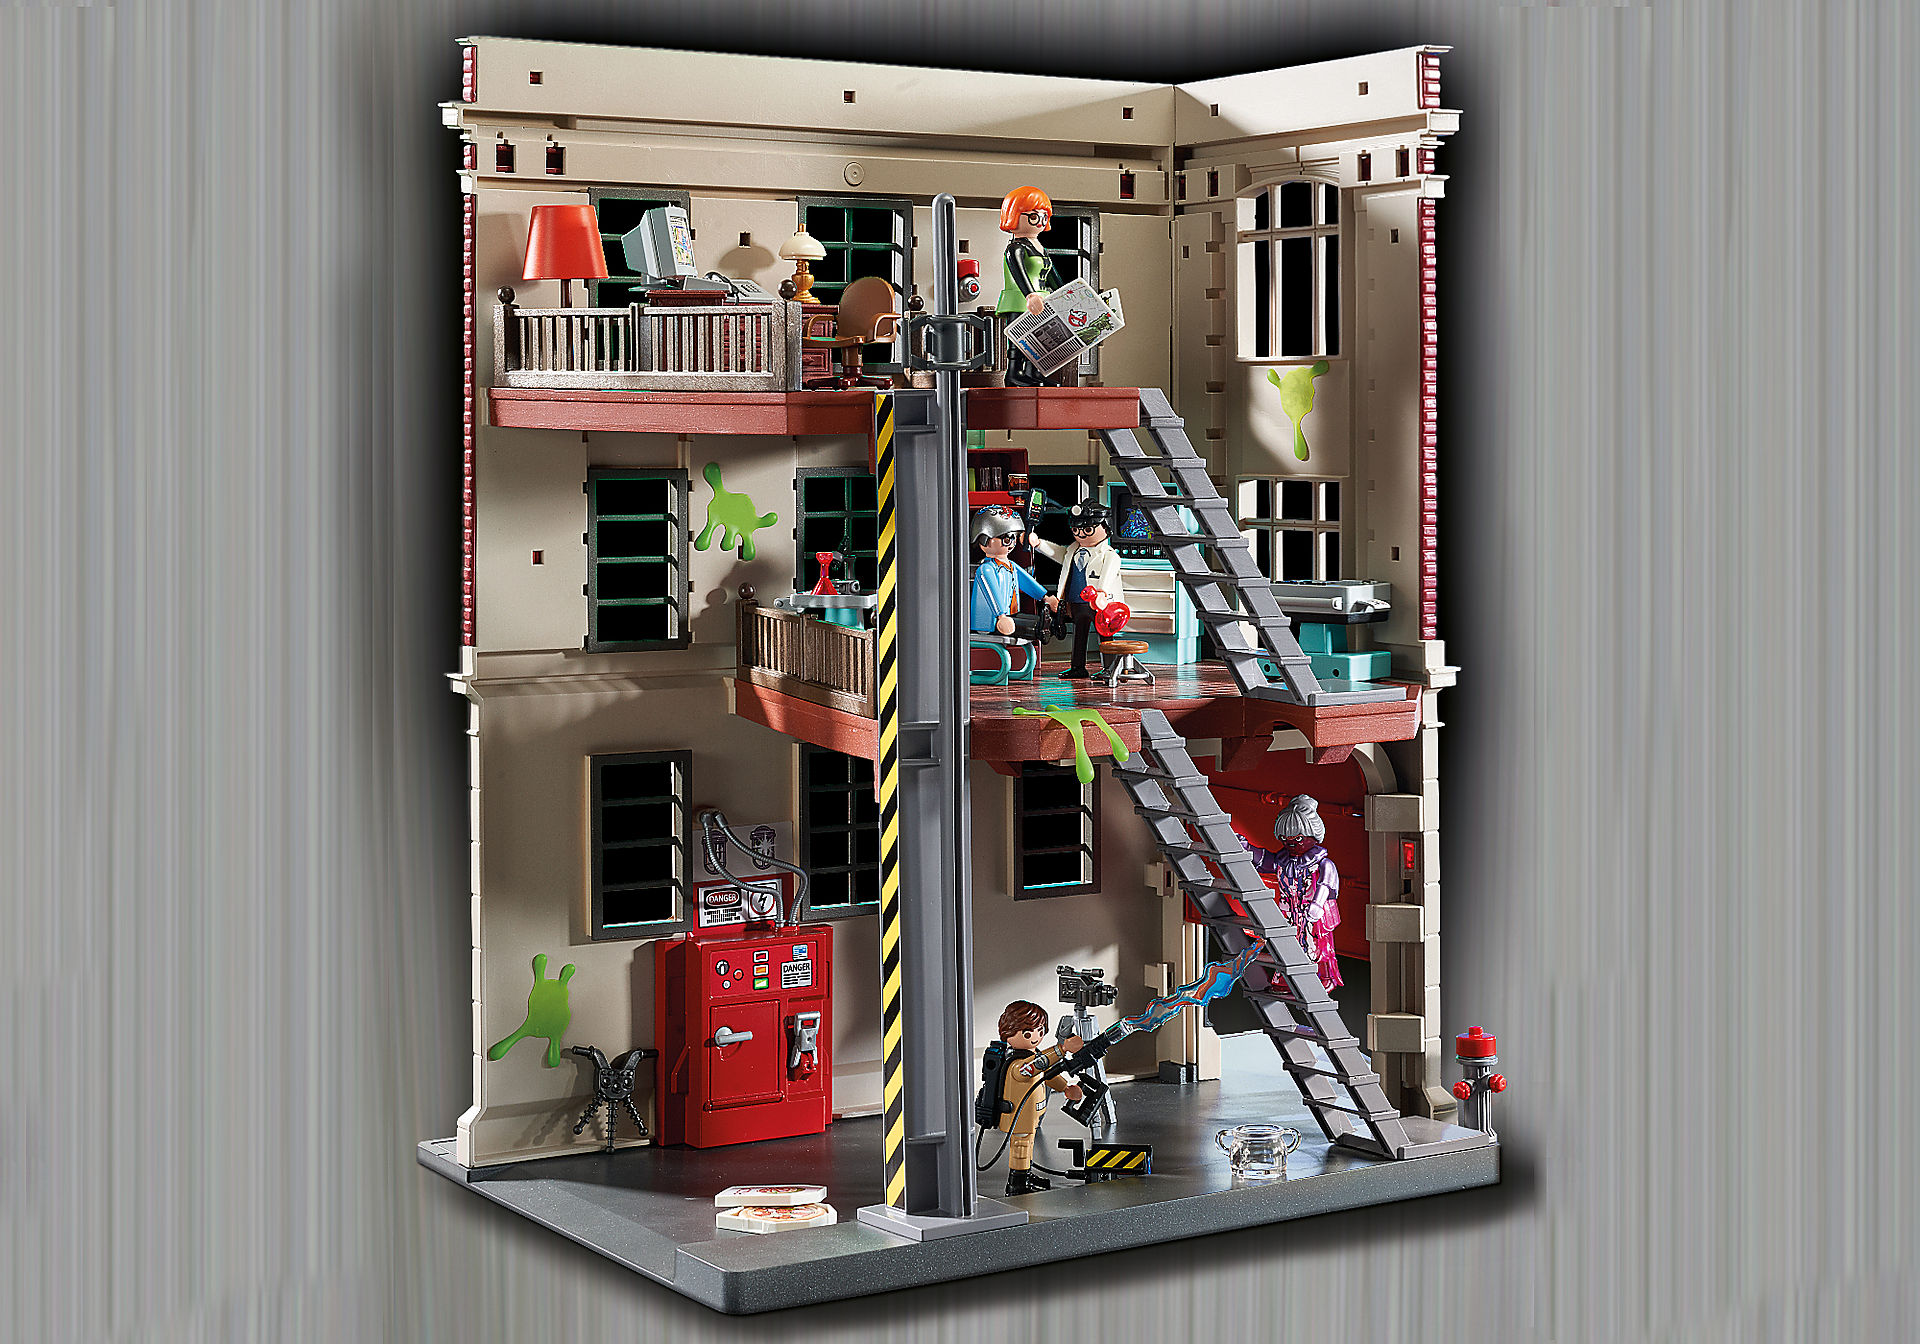 9219 Ghostbusters™ Feuerwache zoom image10